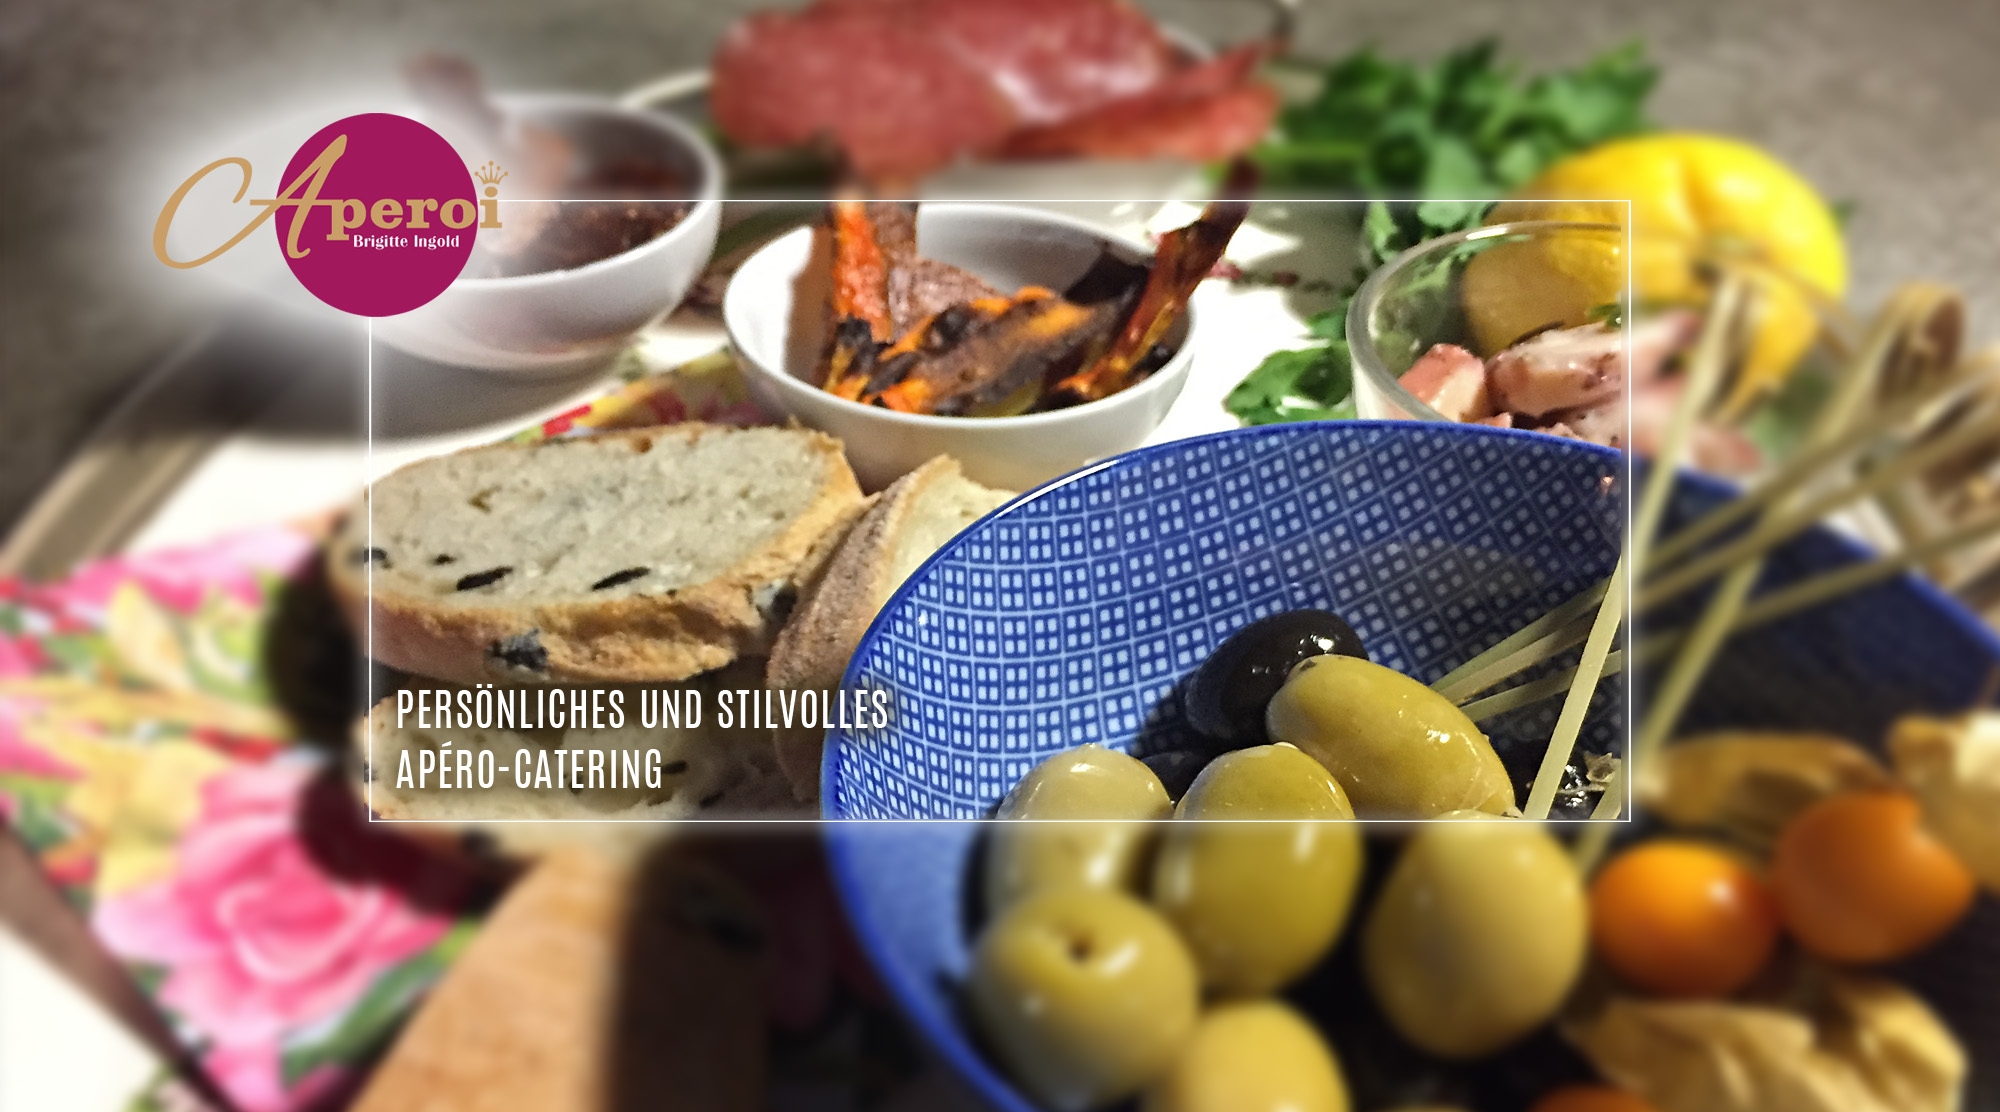 Persönliches & stilvolles Apero-Catering